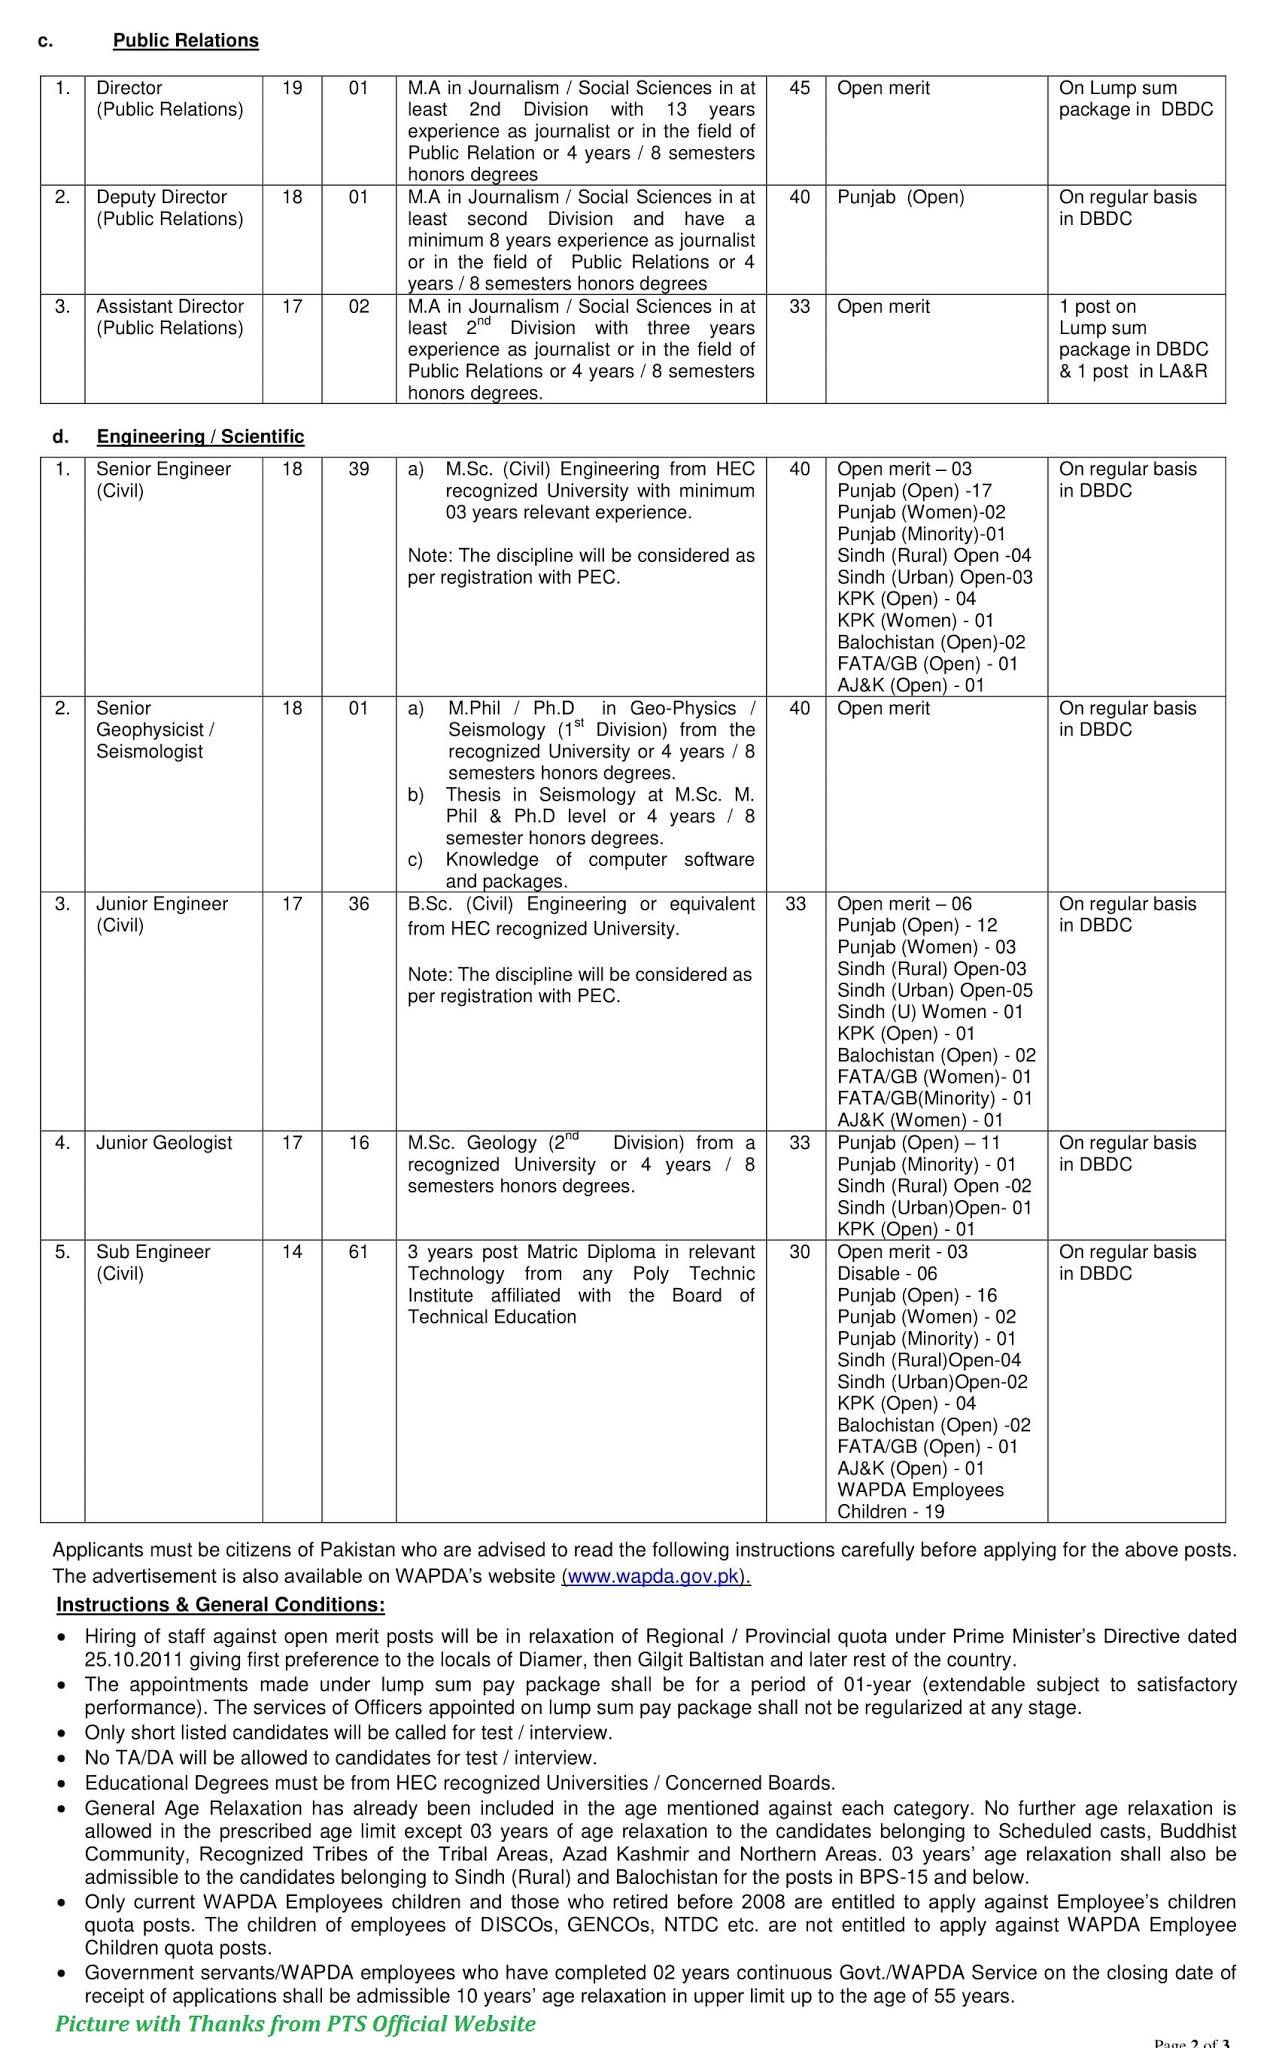 Wapda Jobs 2020 - Latest Jobs in Wapda Diamer Basha Dam & Mega Hydel Project 2020